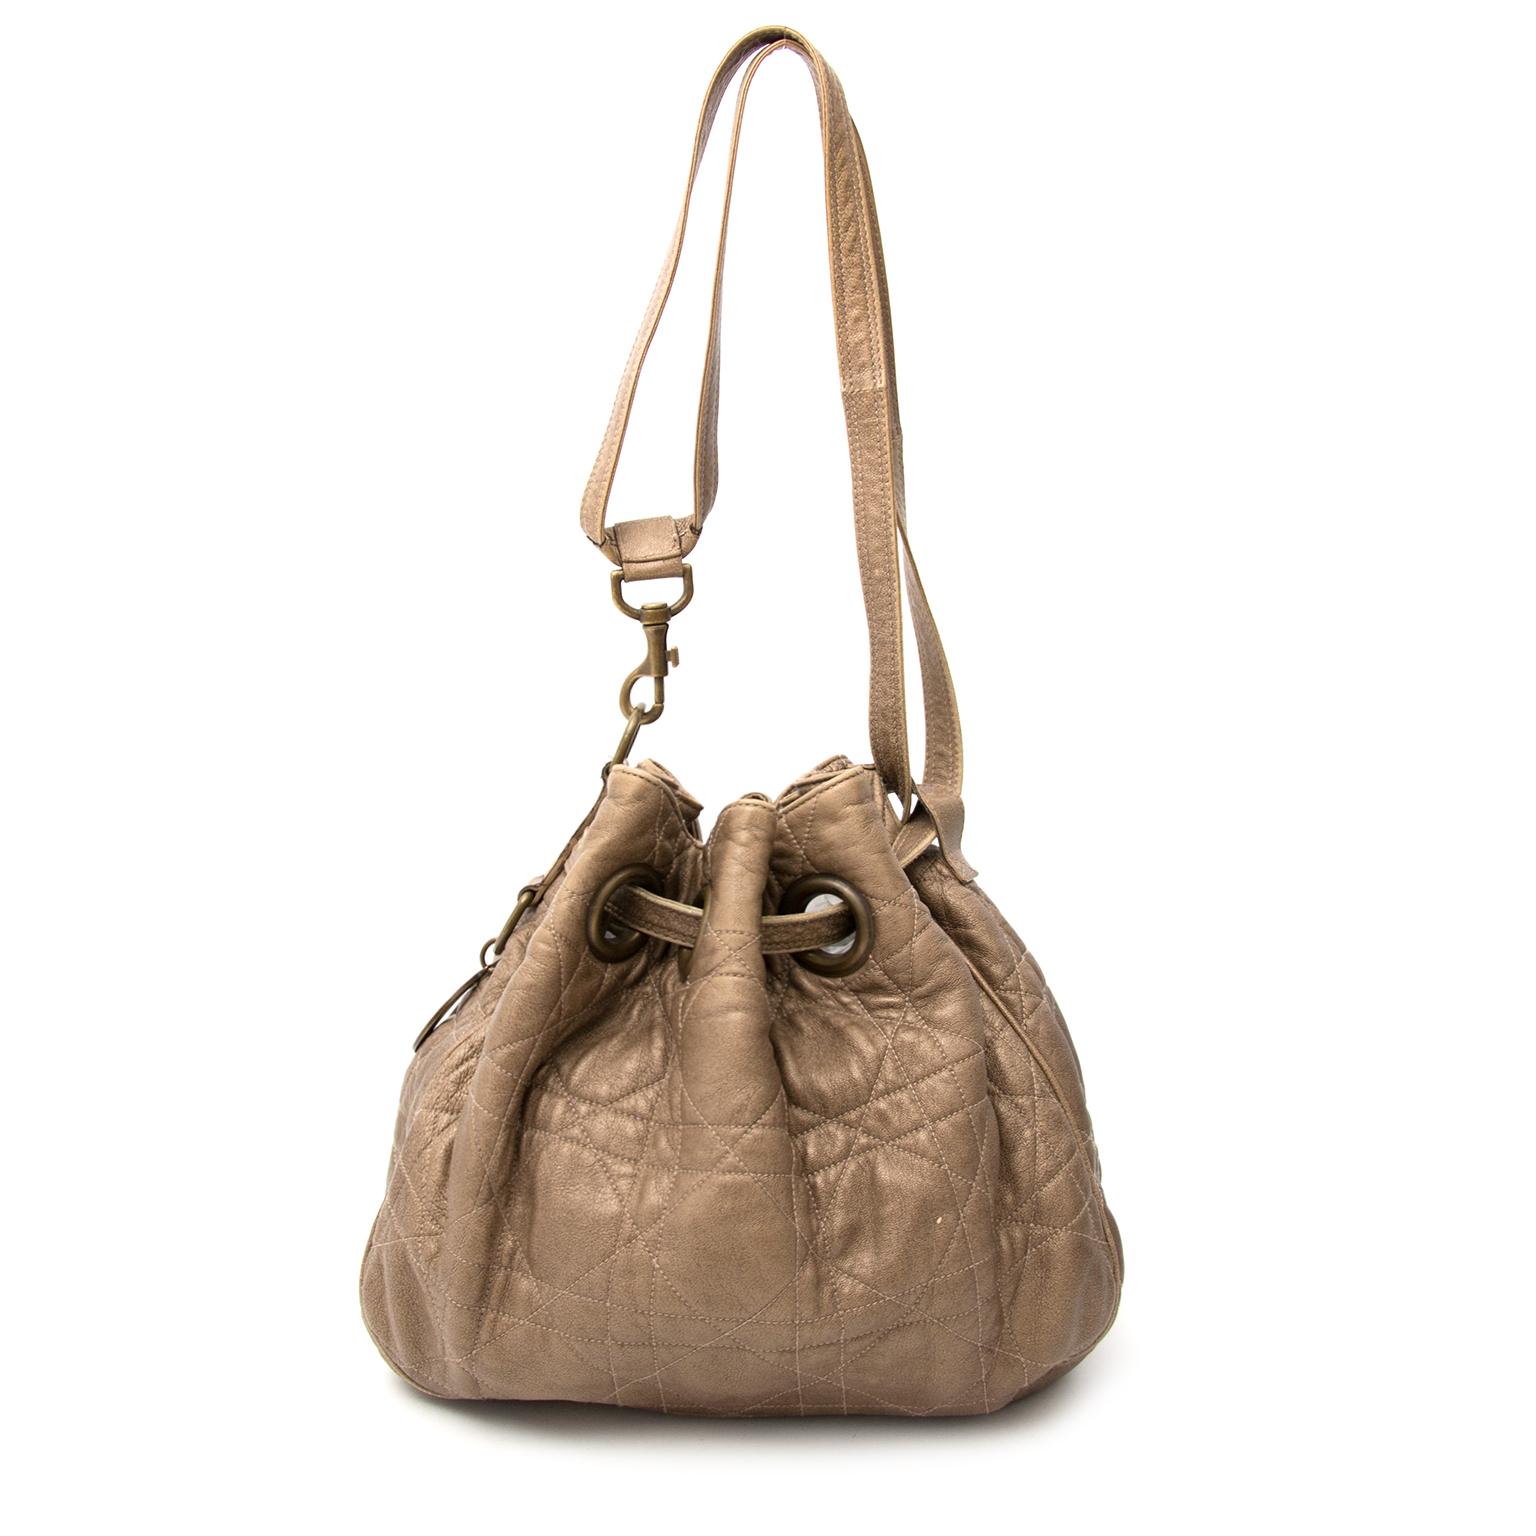 Acheter un Christian Dior Bronze Cannage Drawstring Bag  en ligne